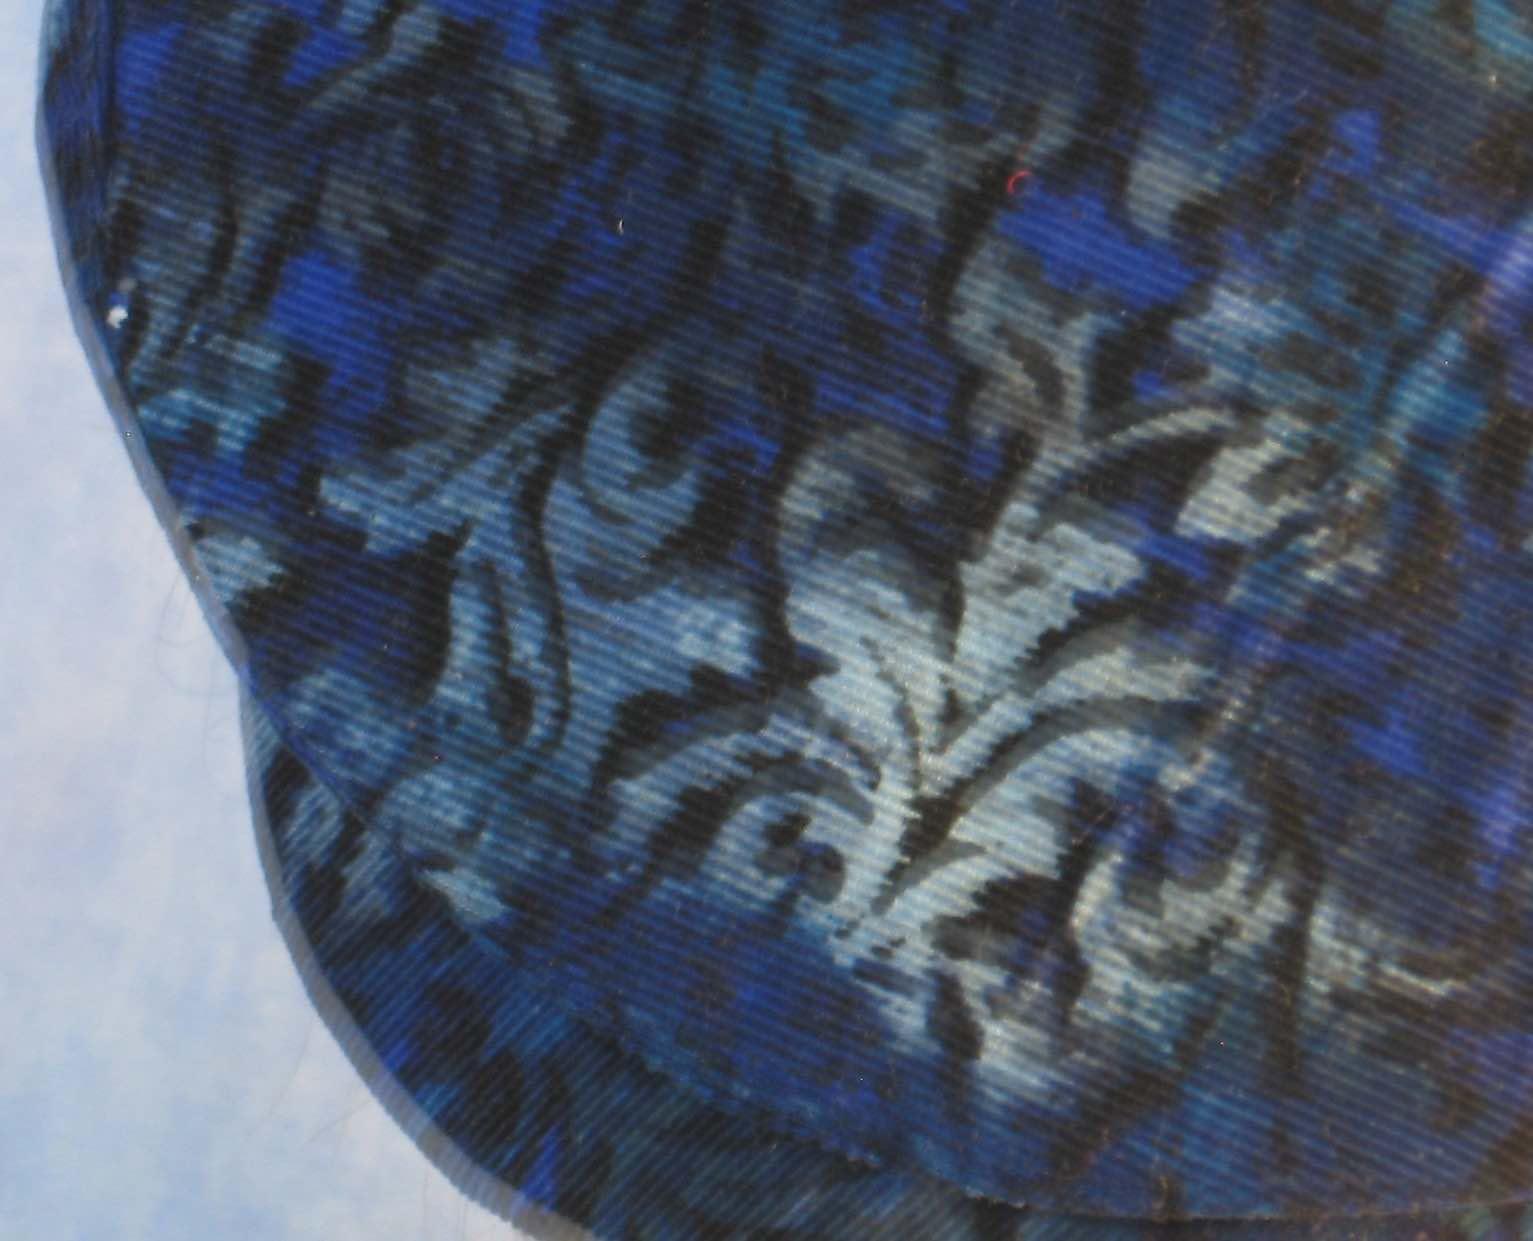 FLCC-BlueBlackFlowerCO-closeup